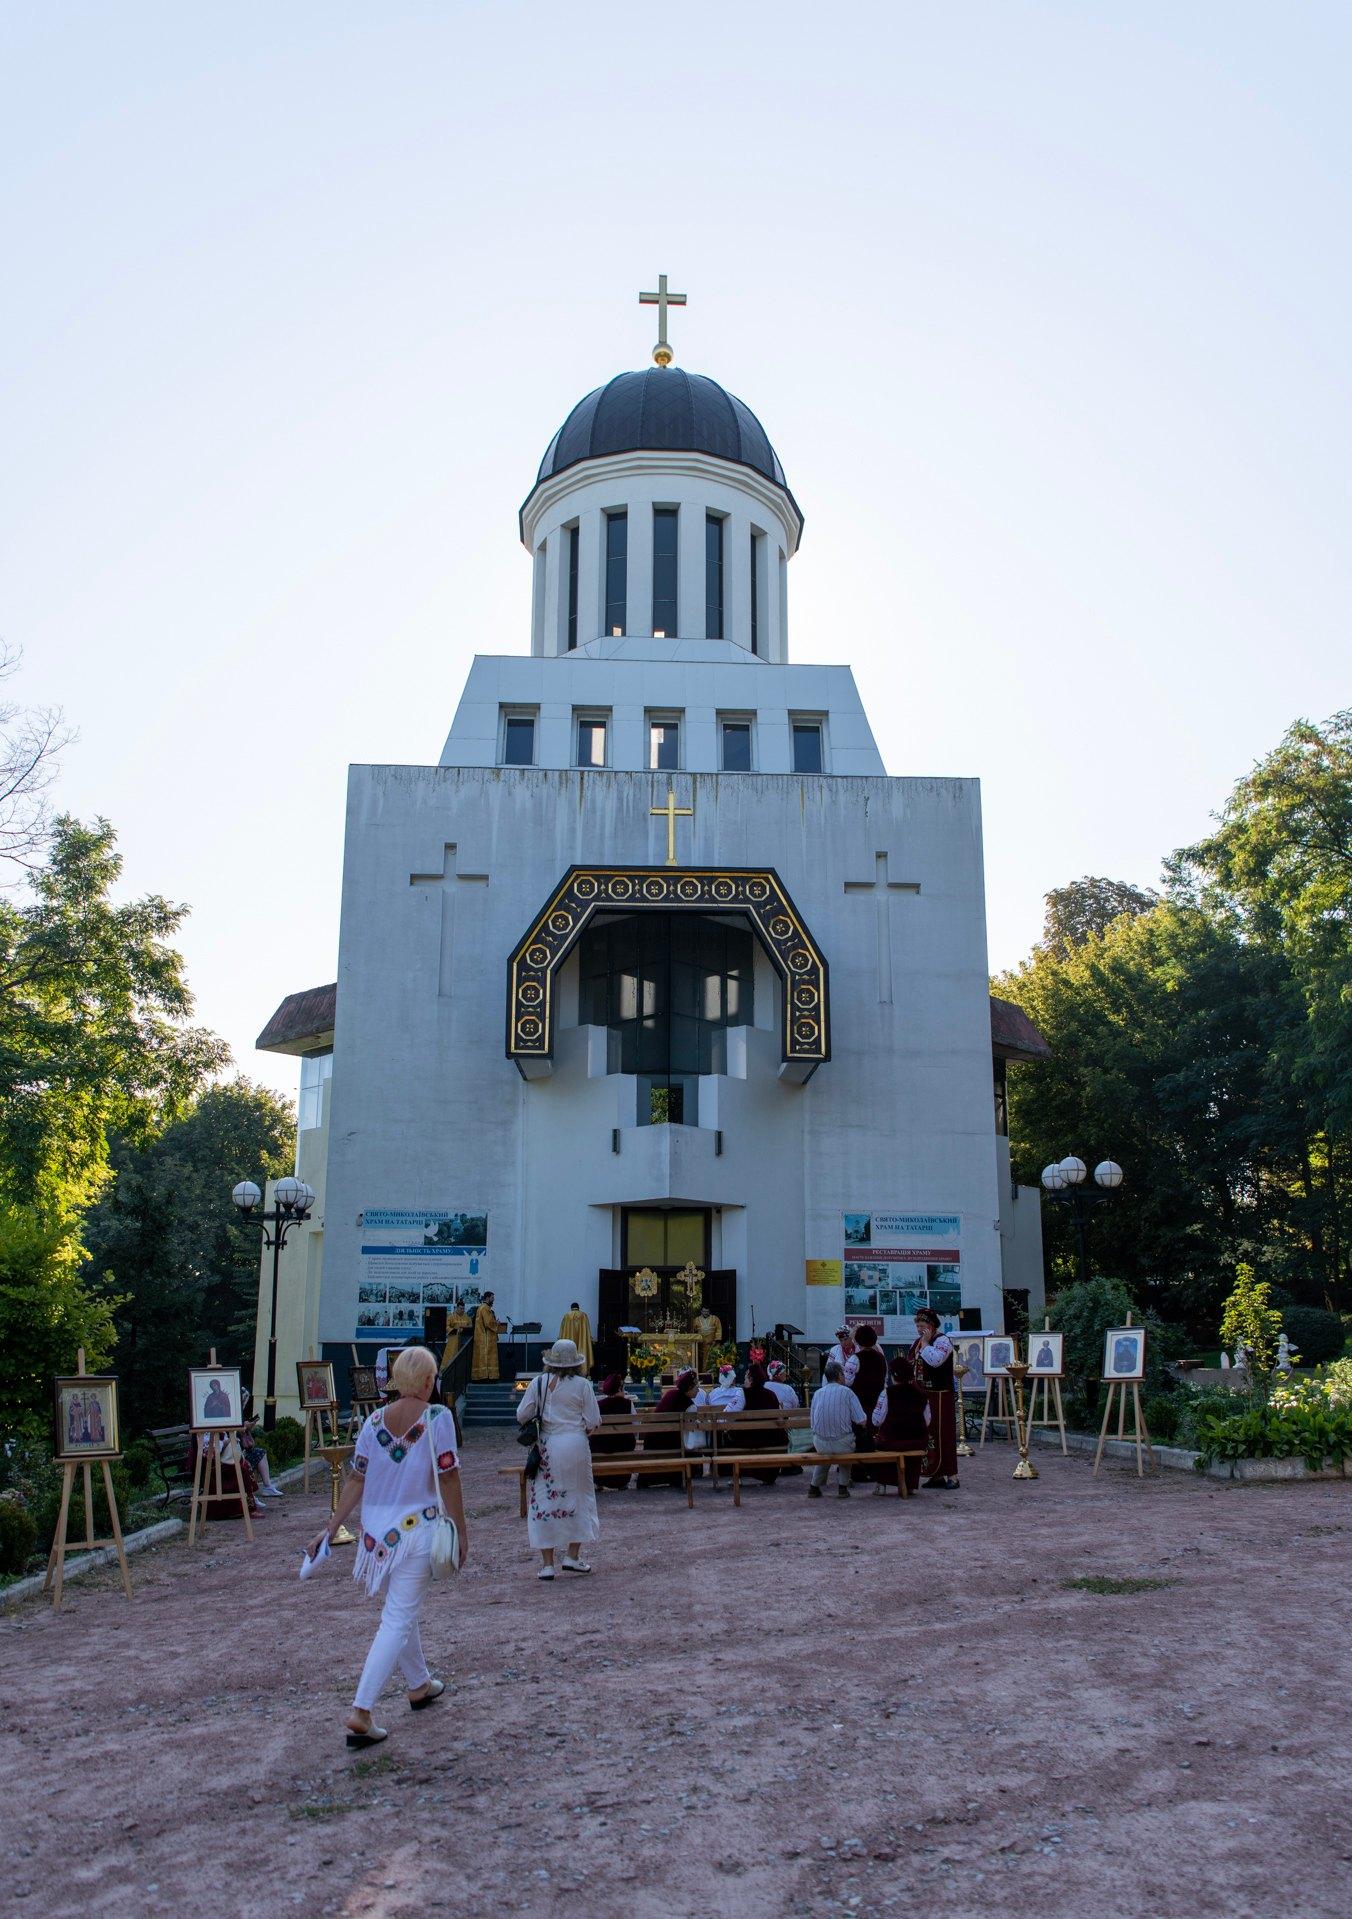 https://i1.wp.com/df.news/wp-content/uploads/2021/08/Tatarka-01.jpg?fit=1352%2C1919&ssl=1